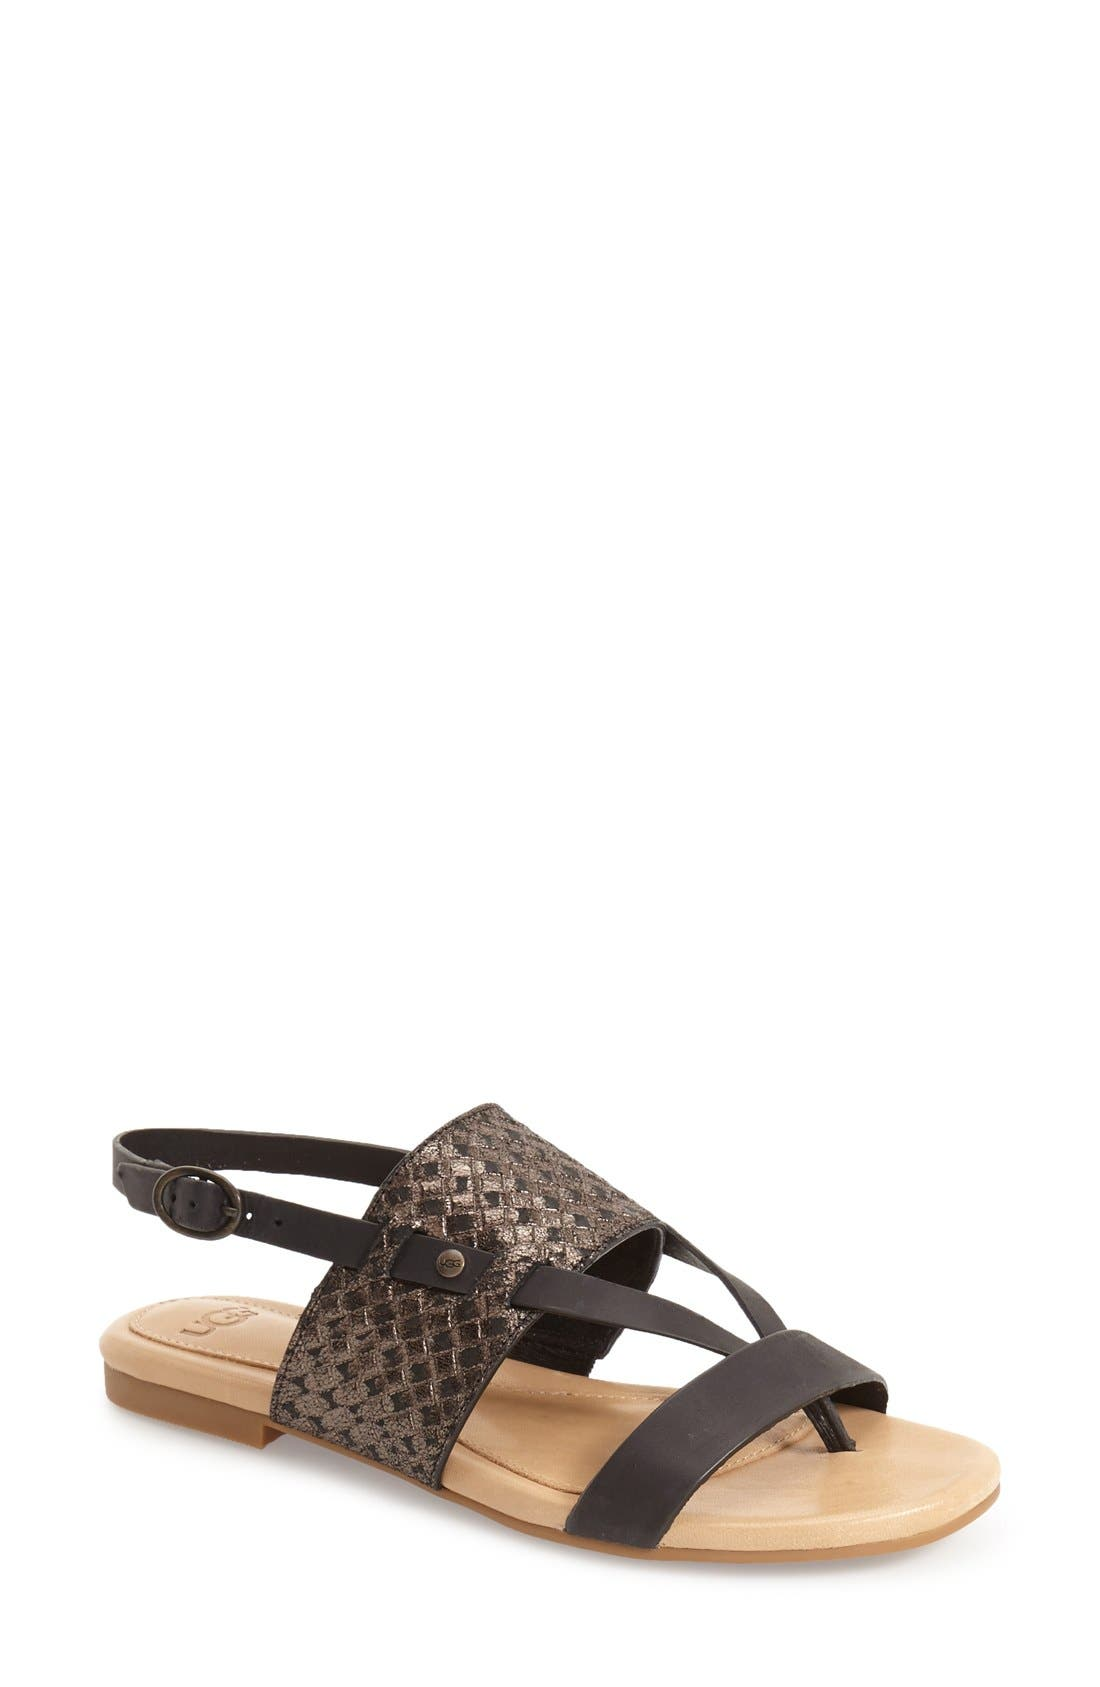 'Verona' Slingback Sandal, Main, color, 001